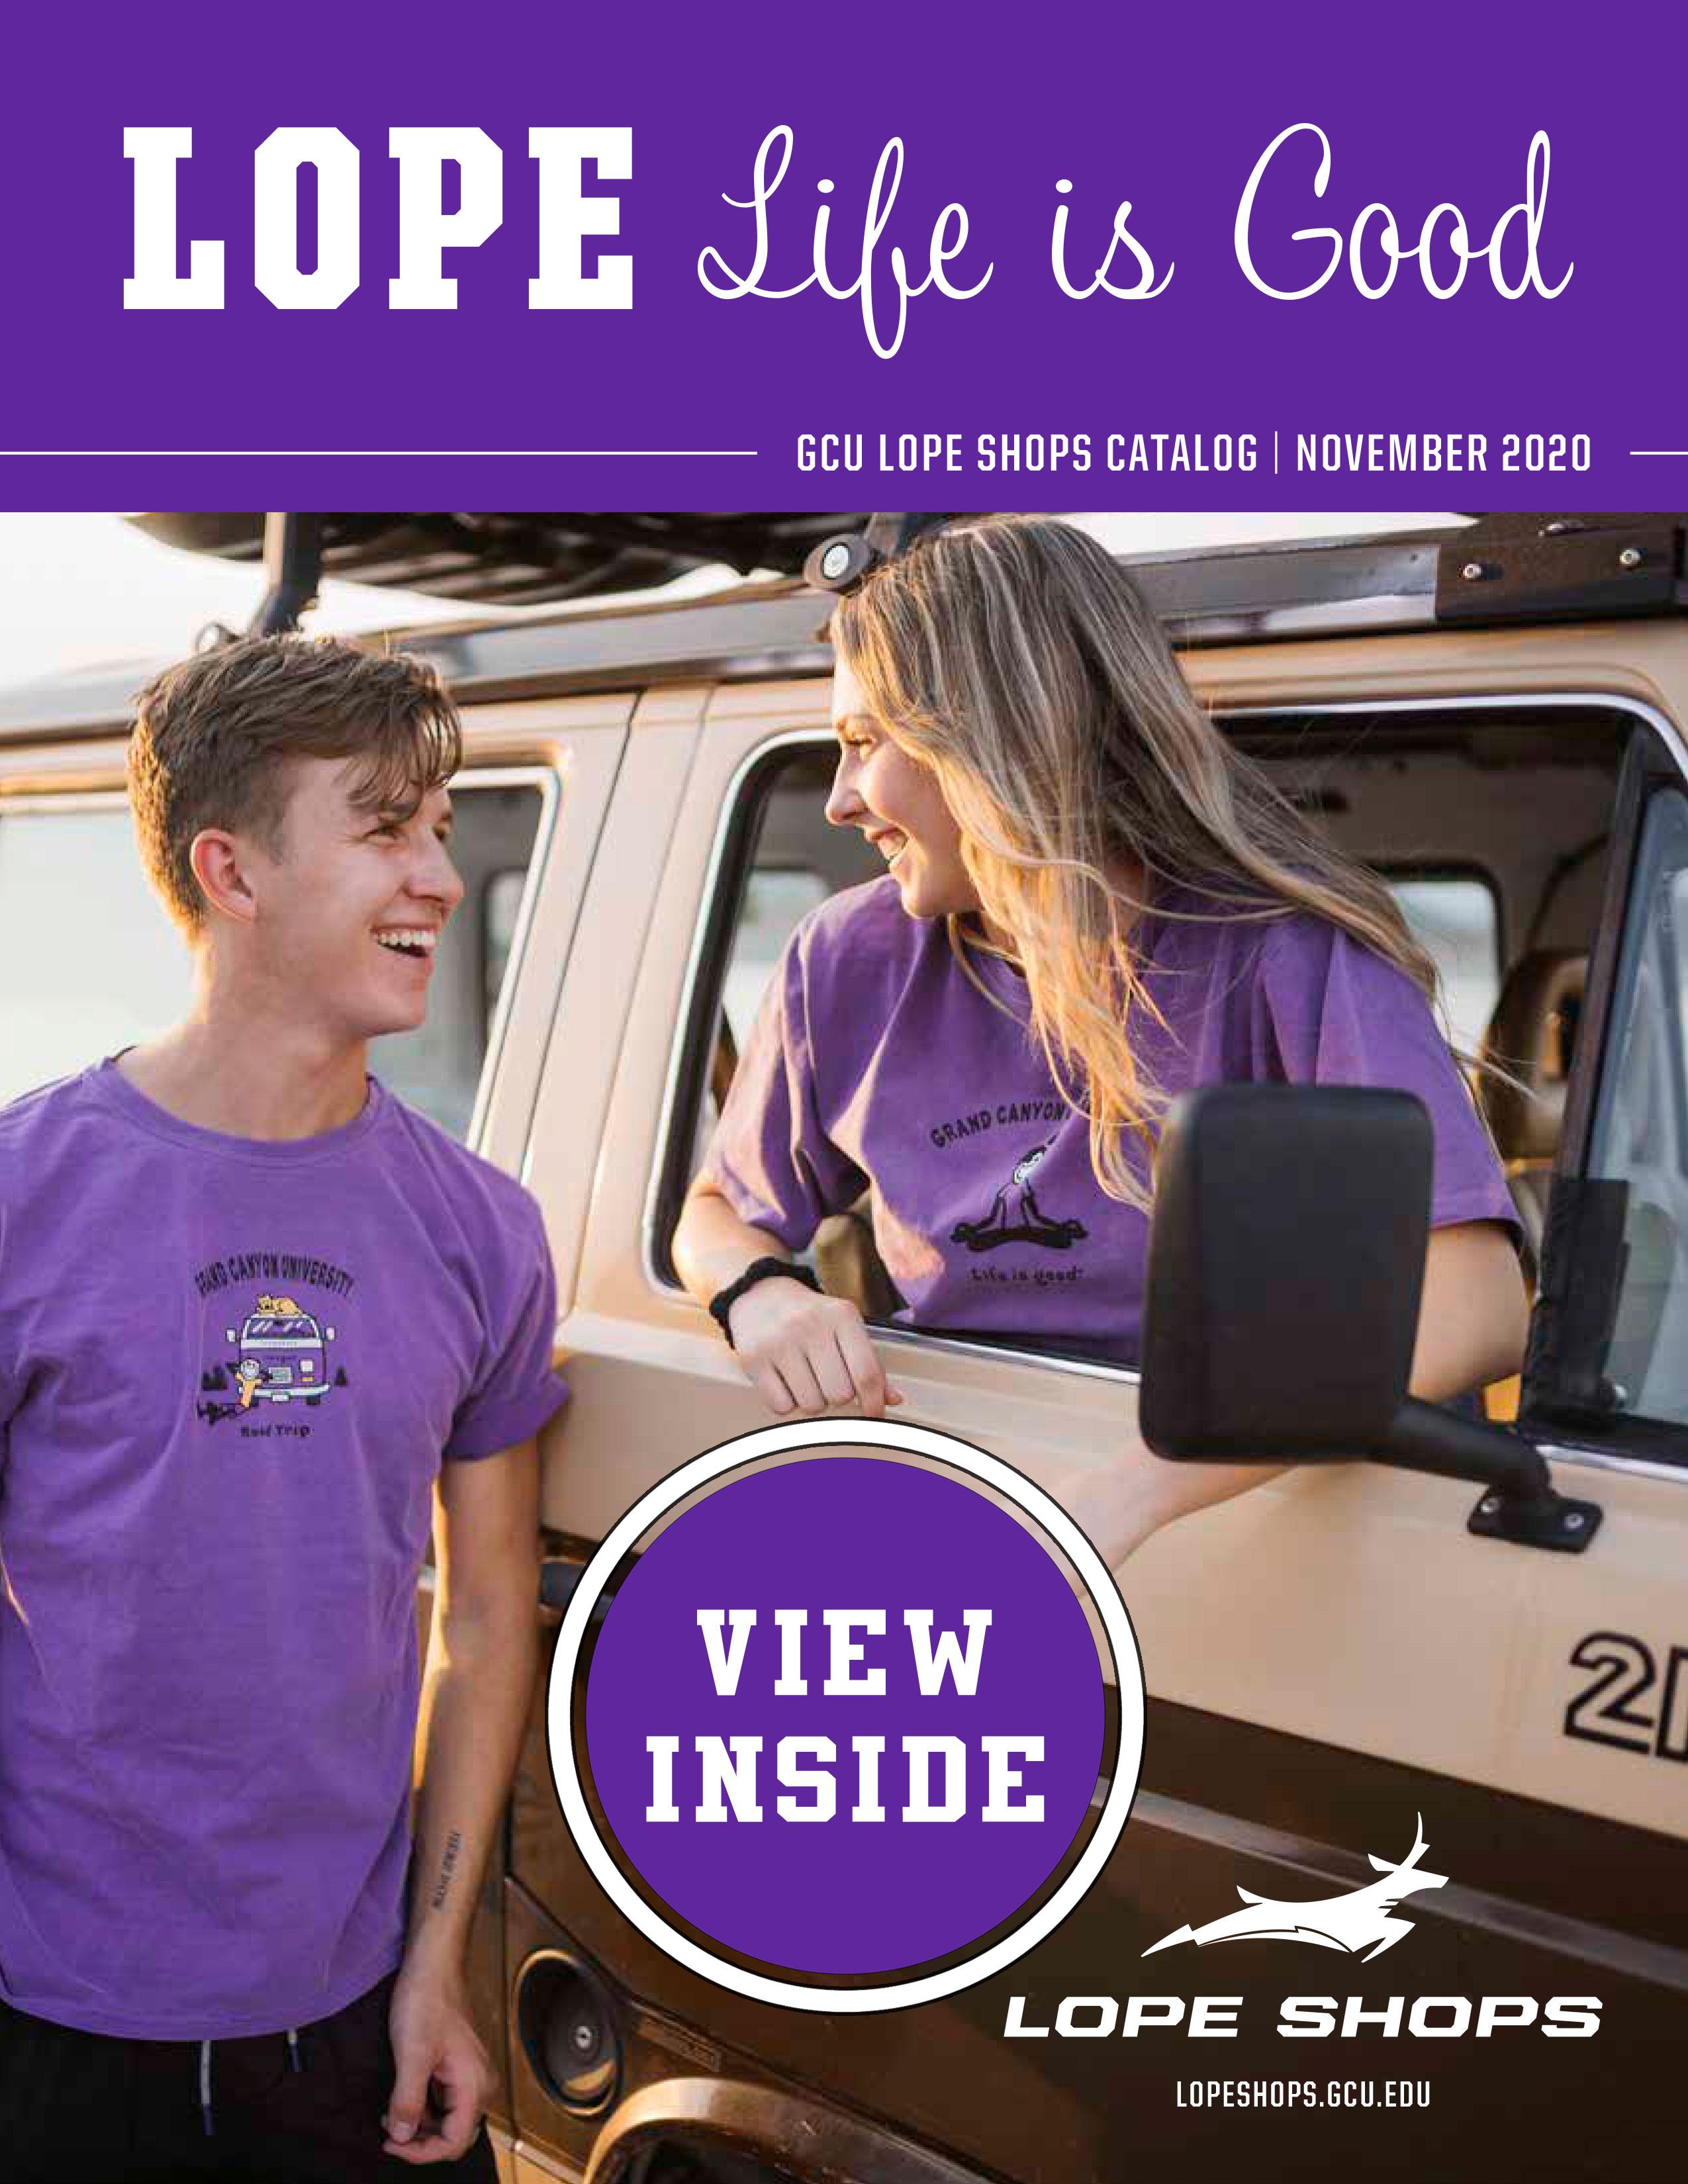 Lope Life, GCU Lope Shops Catalog Fall 2020